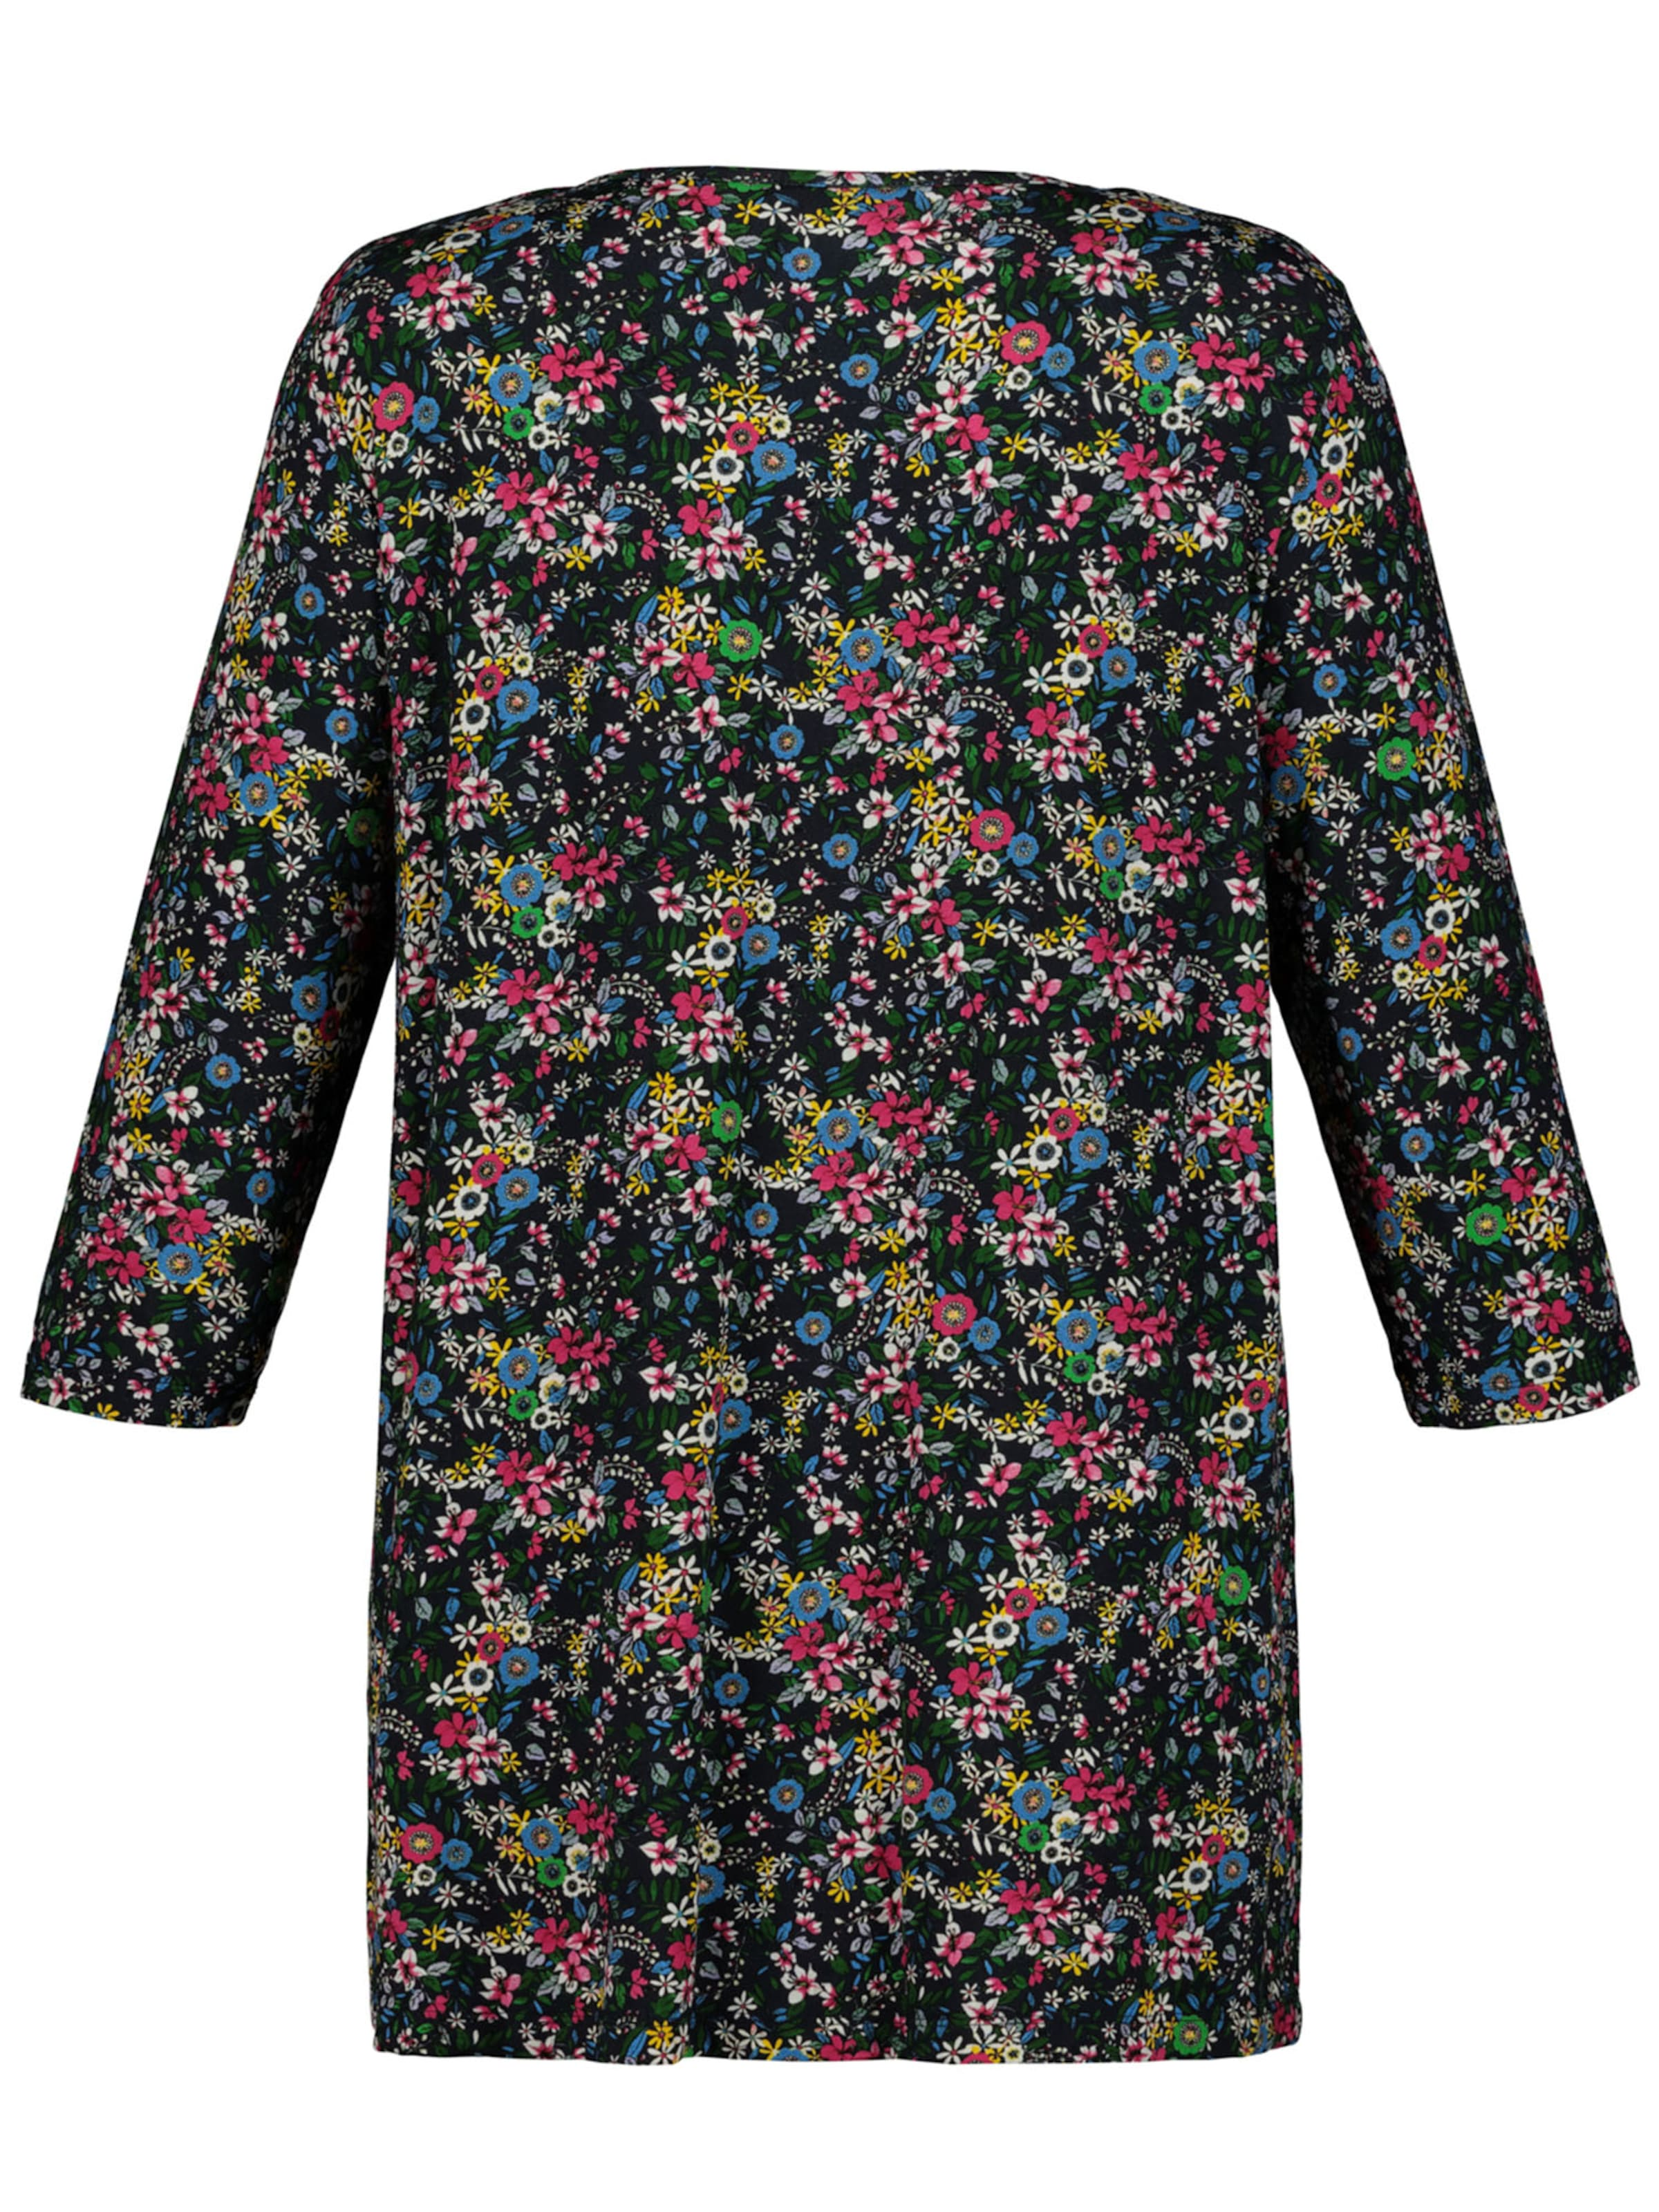 shirt En Foncé Bleu T Ulla Popken XTkwOiuPZ